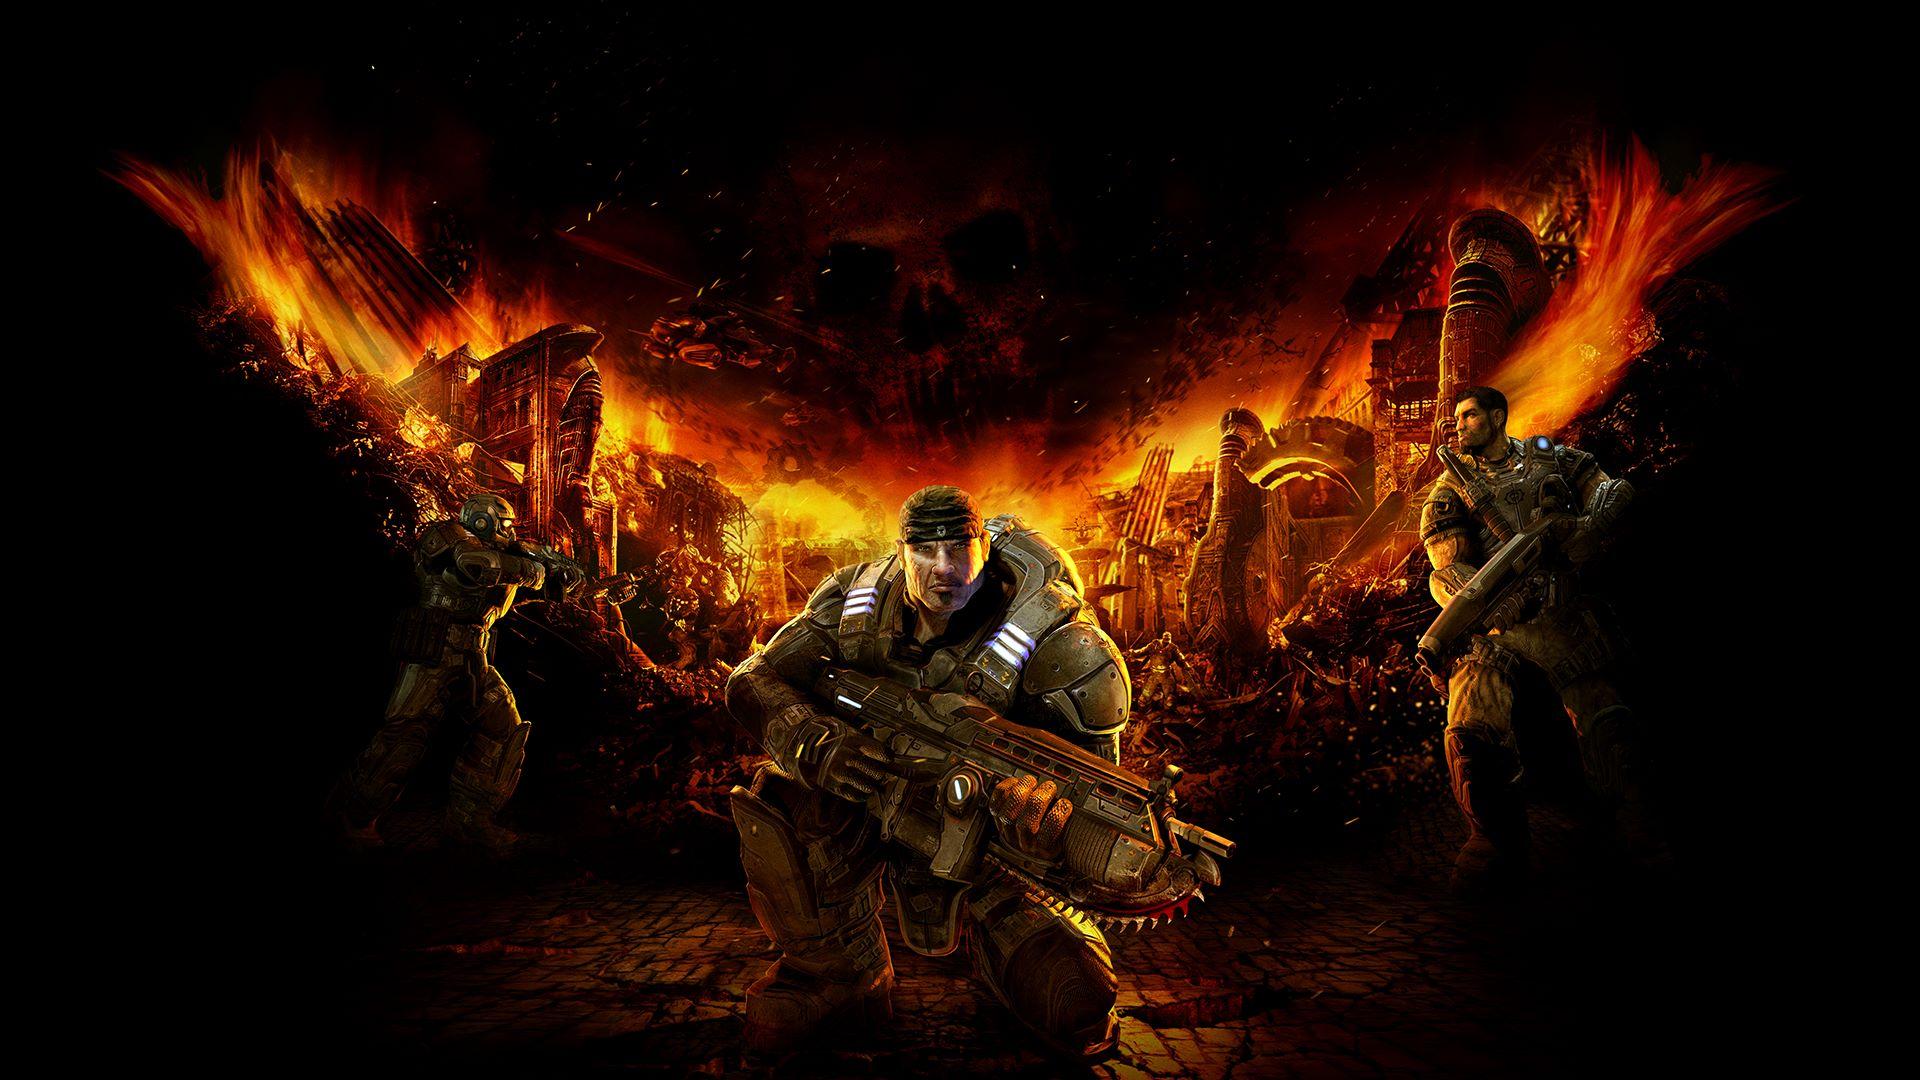 gears of war の生みの親クリフ ブレジンスキー氏 二度とゲームを